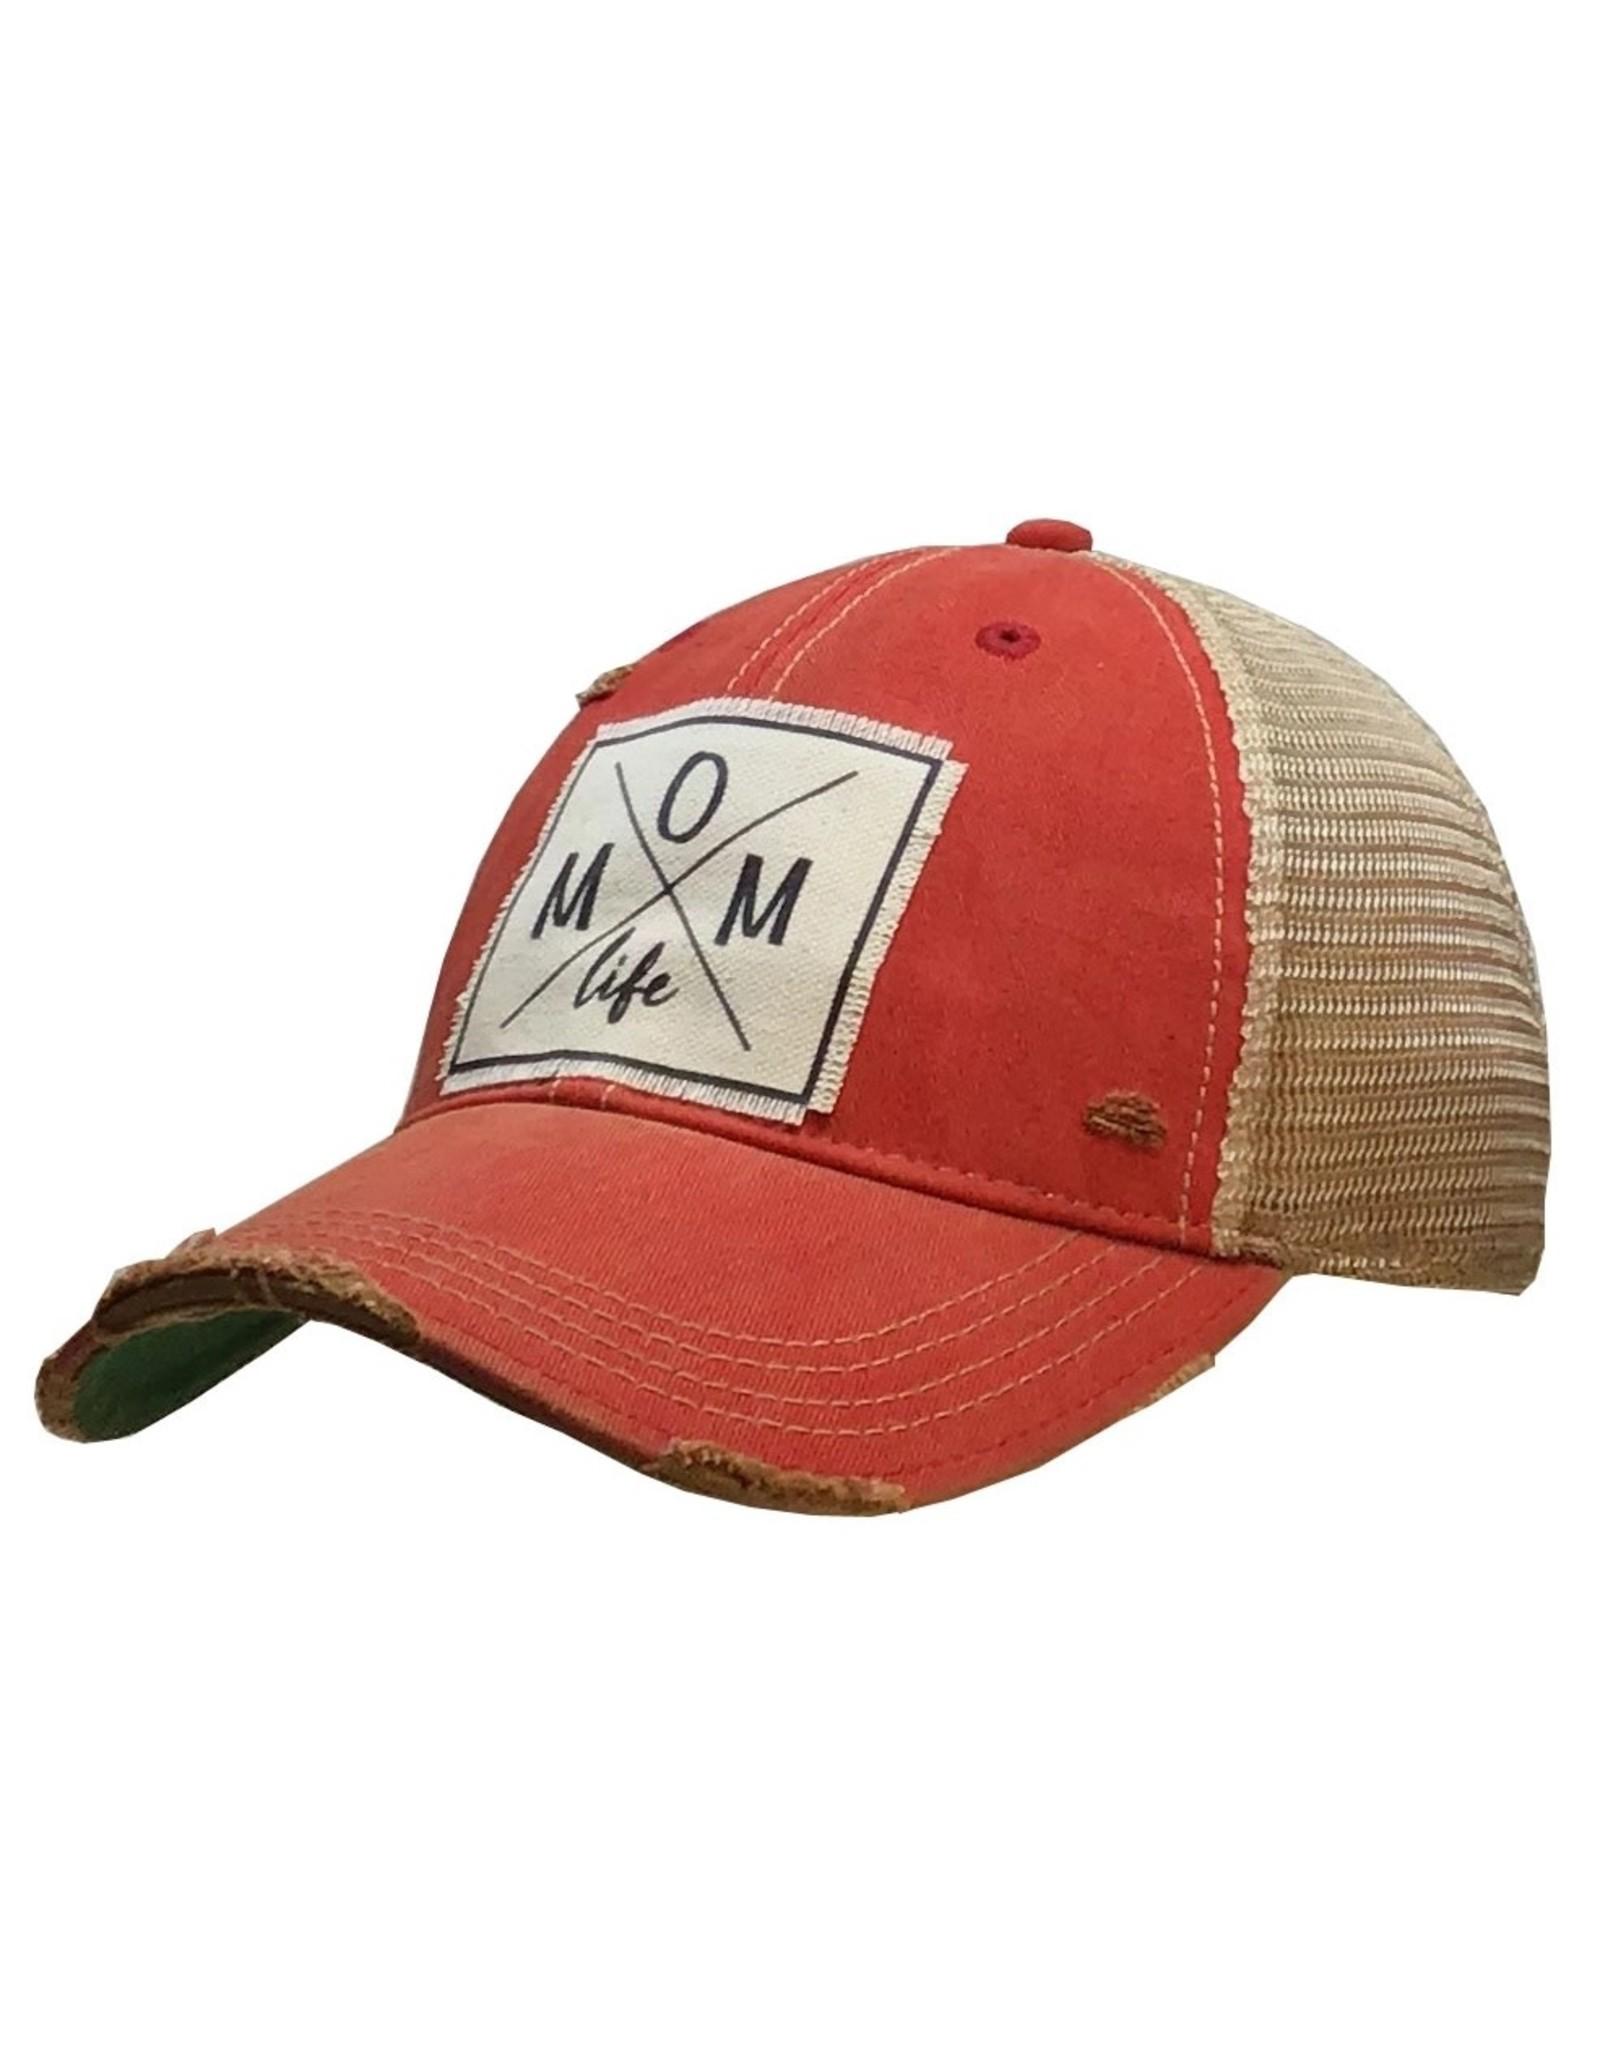 "Landmark Products Light Red ""Mom Life"" Distressed Trucker Cap"